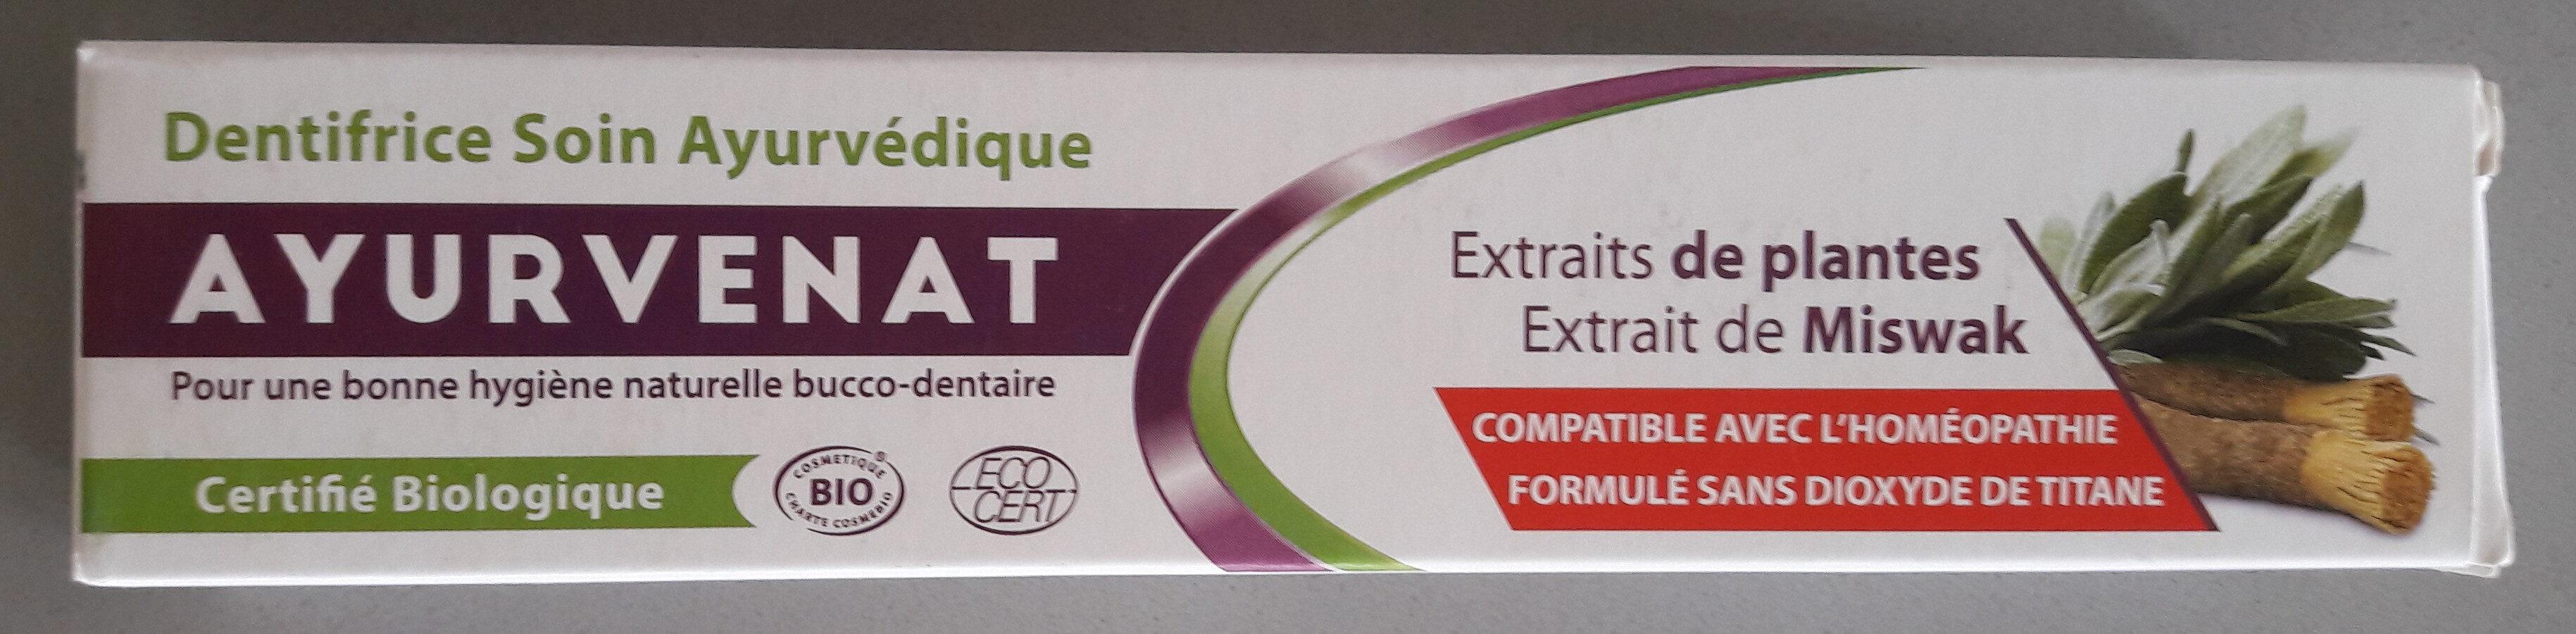 Dentifrice Soin ayurvédique - Produit - fr